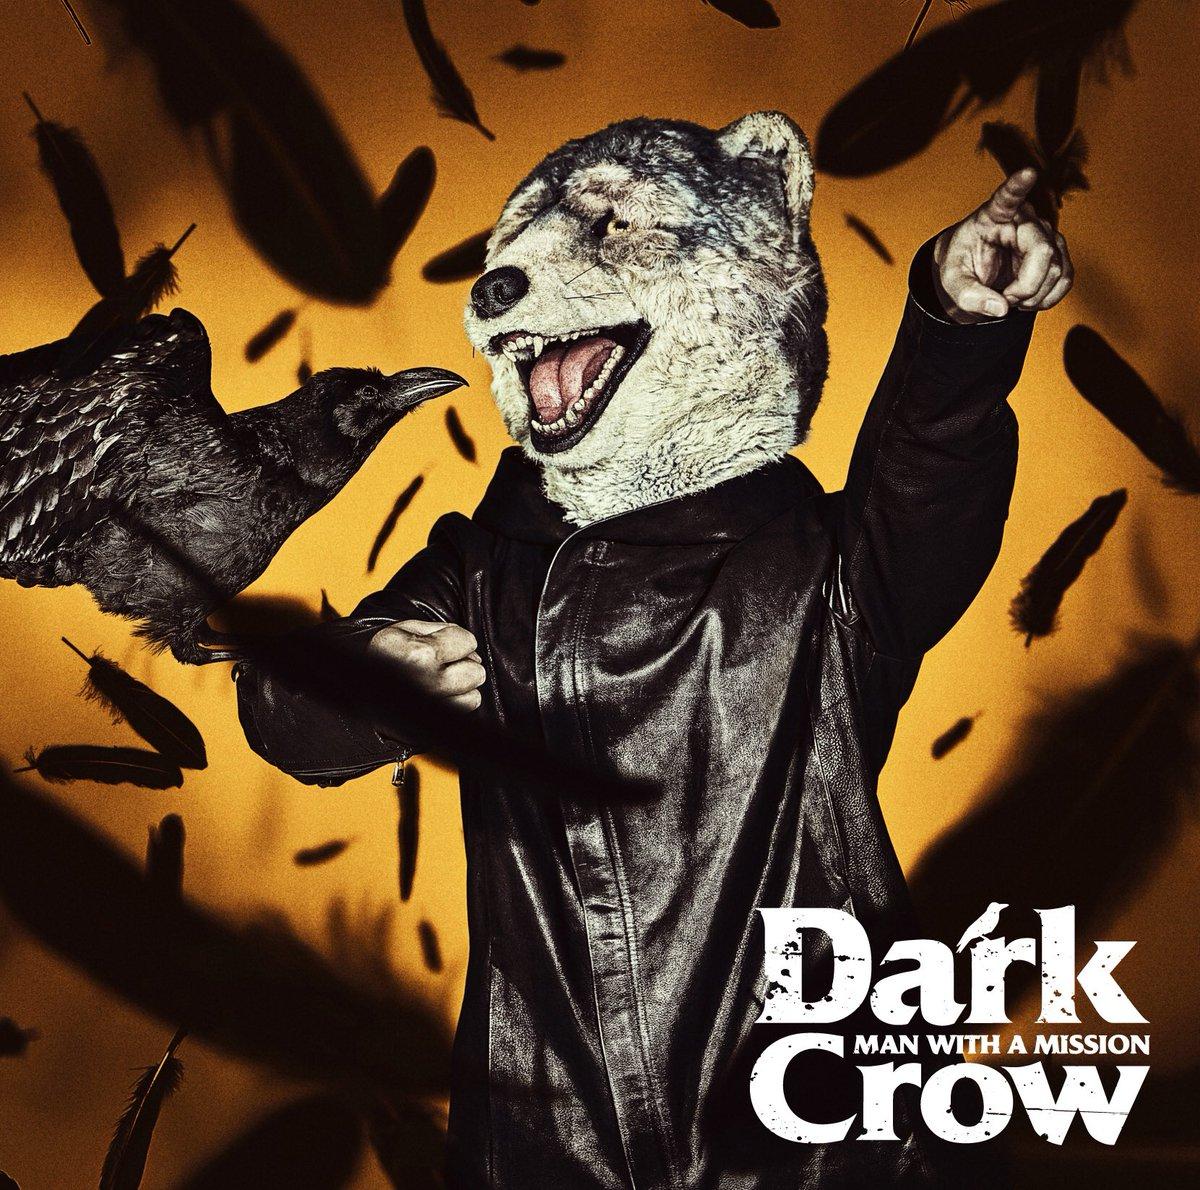 『MAN WITH A MISSION - Dark Crow 歌詞』収録の『Dark Crow』ジャケット